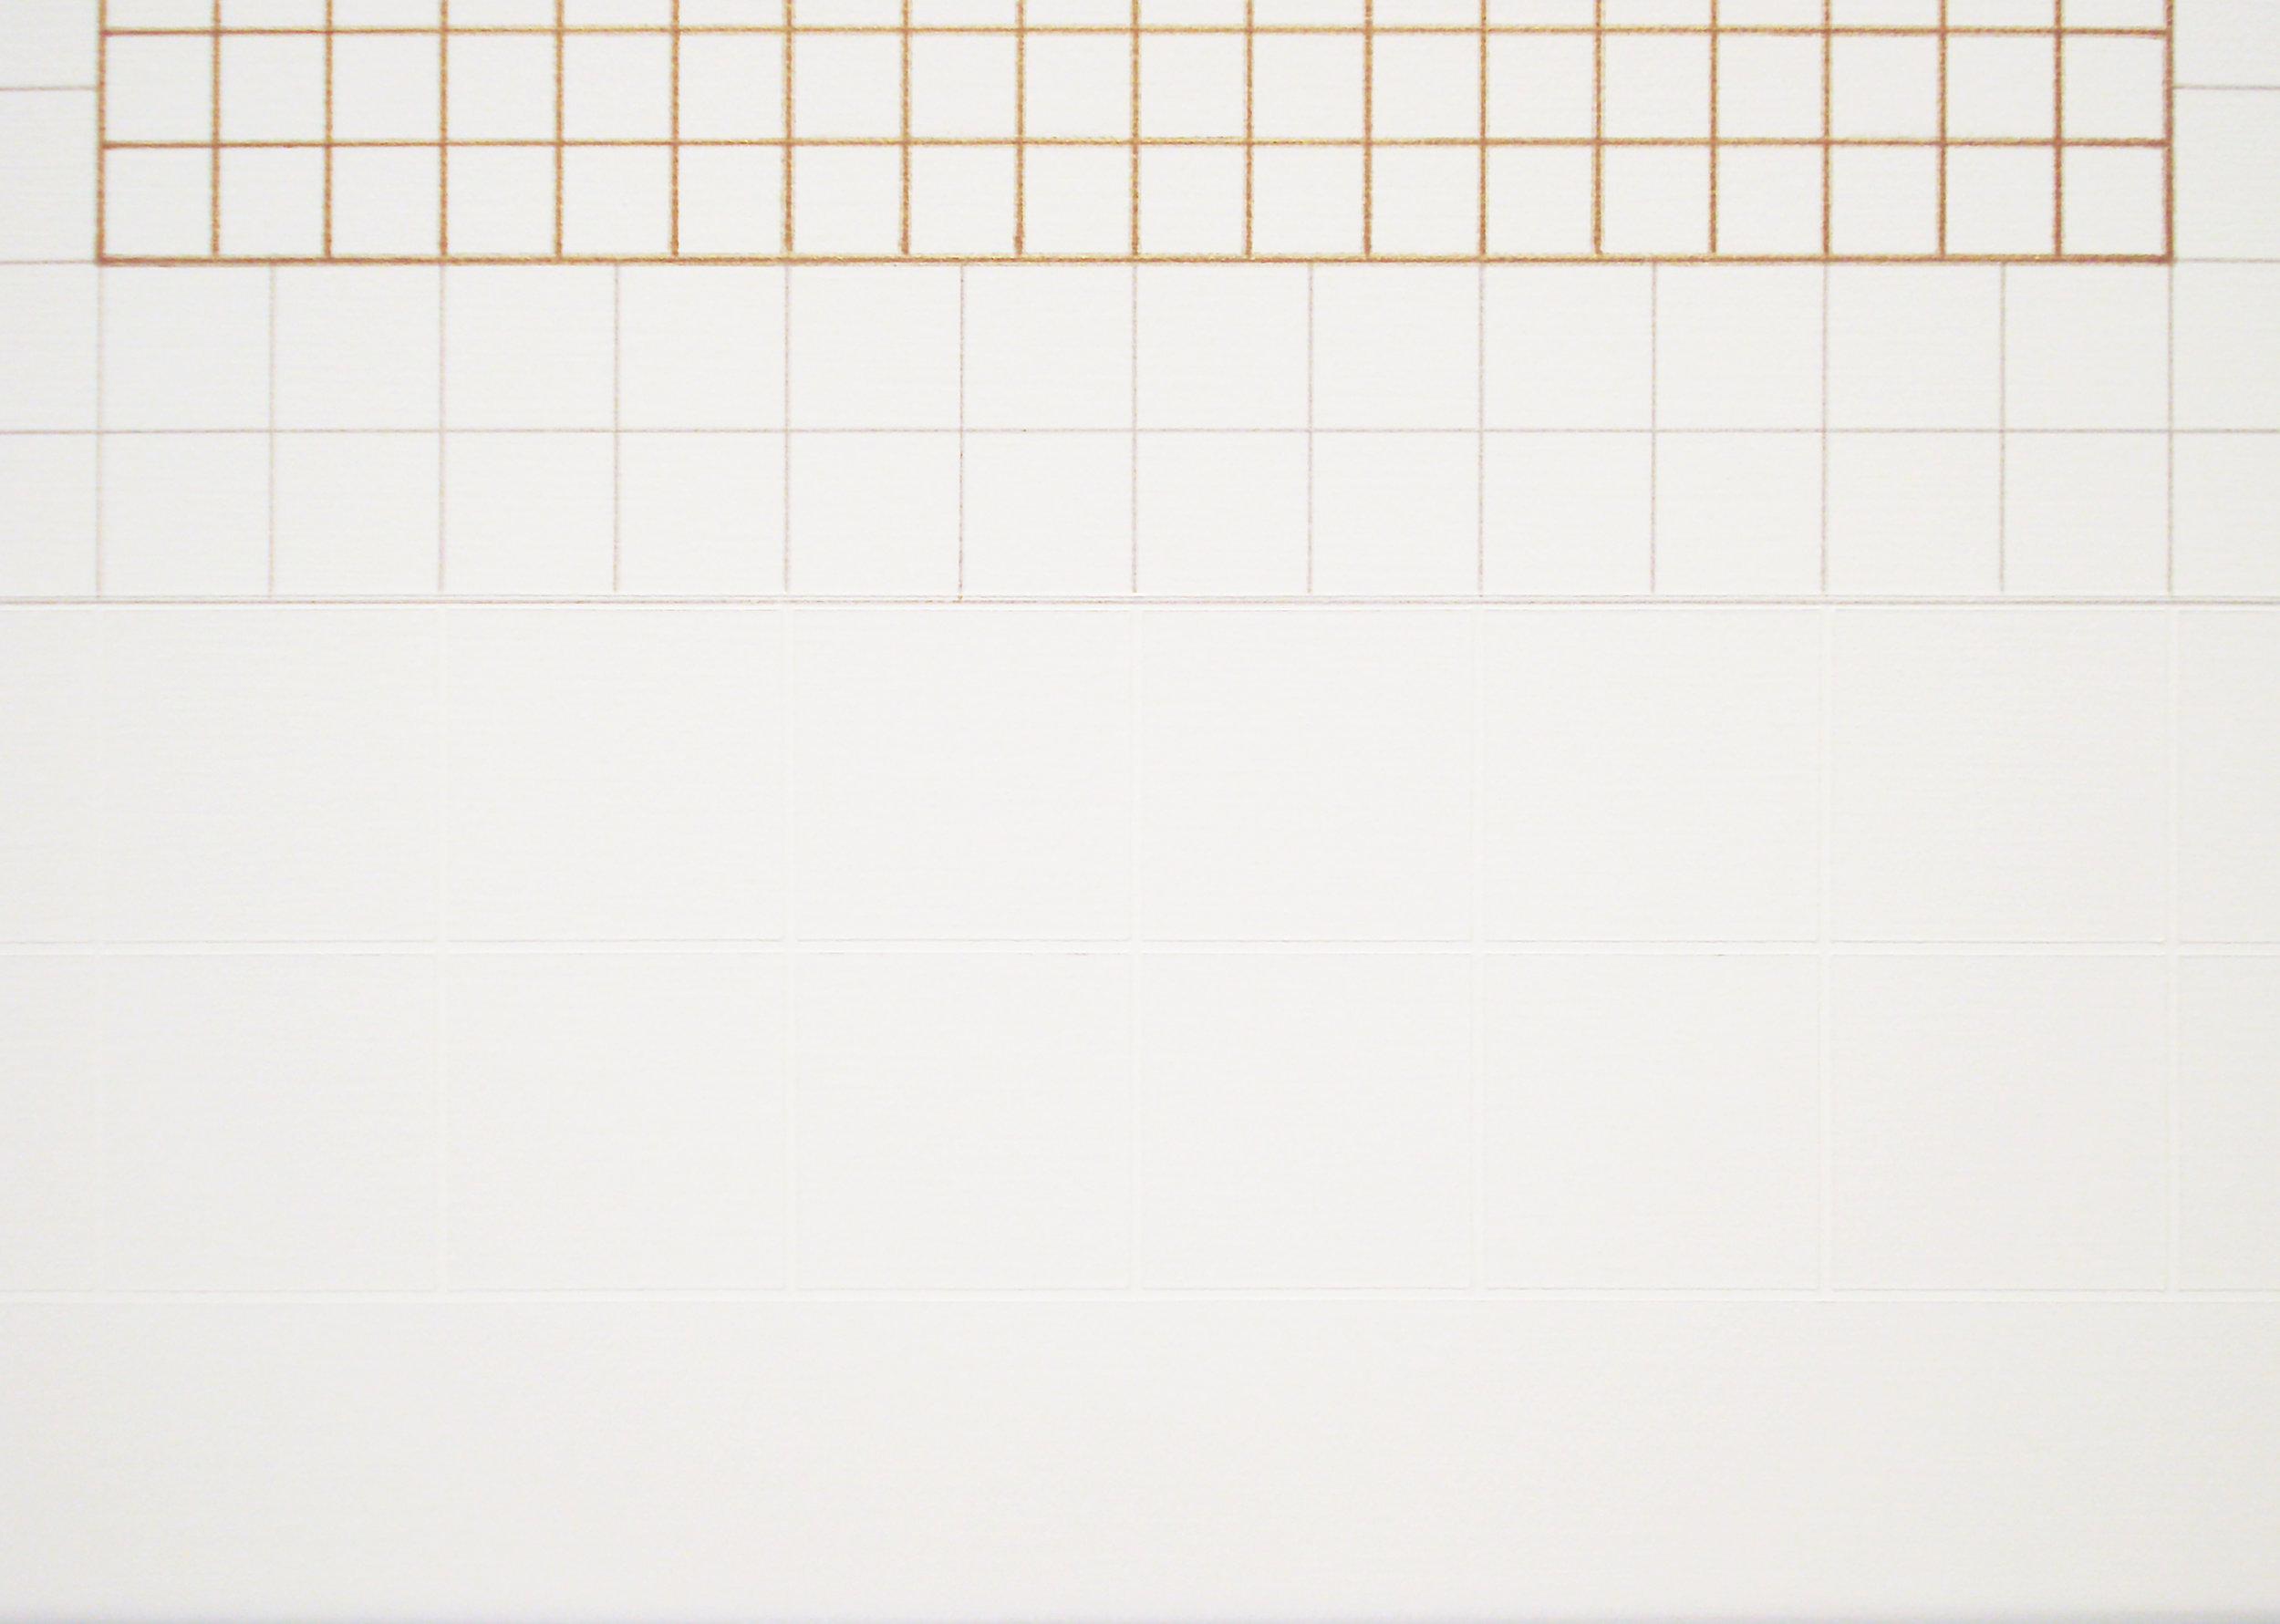 Yantra-origo-metrum [20180512]_2018_acrylic-on-canvas_29 1-2x23 5-8 in.[75x60cm]-8.jpg